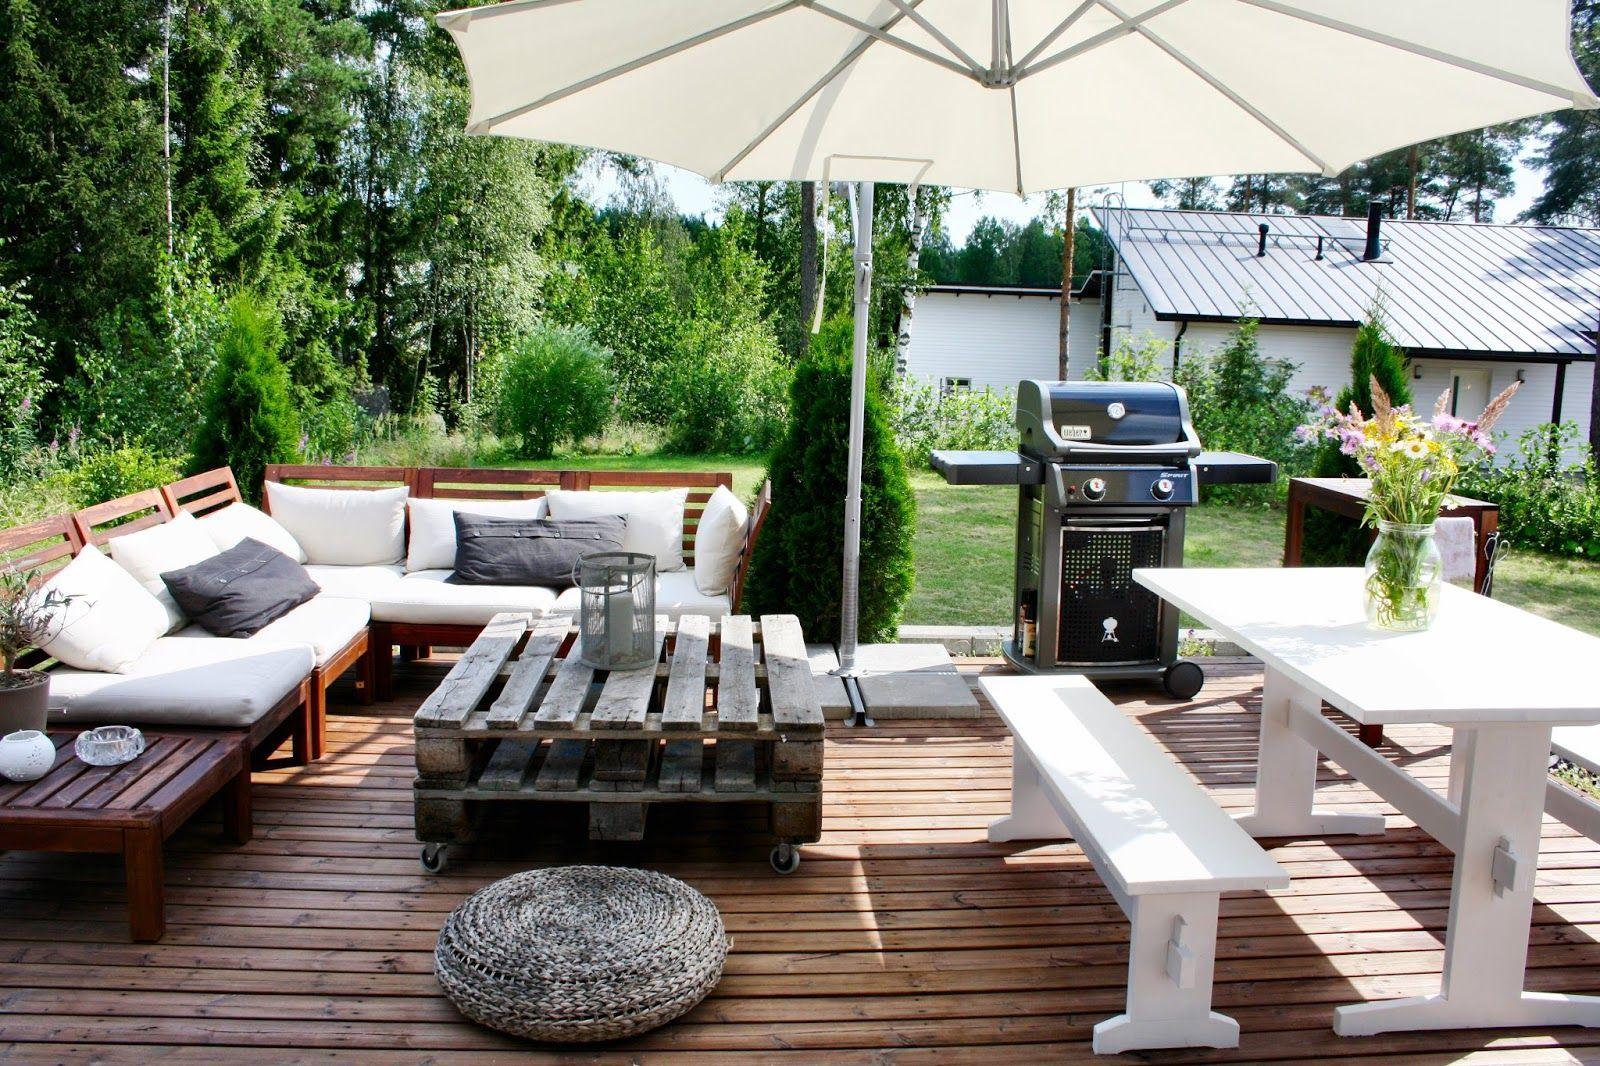 outdoor terrace patio garden ikea pplar kuormalava pirttip yt wohnung. Black Bedroom Furniture Sets. Home Design Ideas